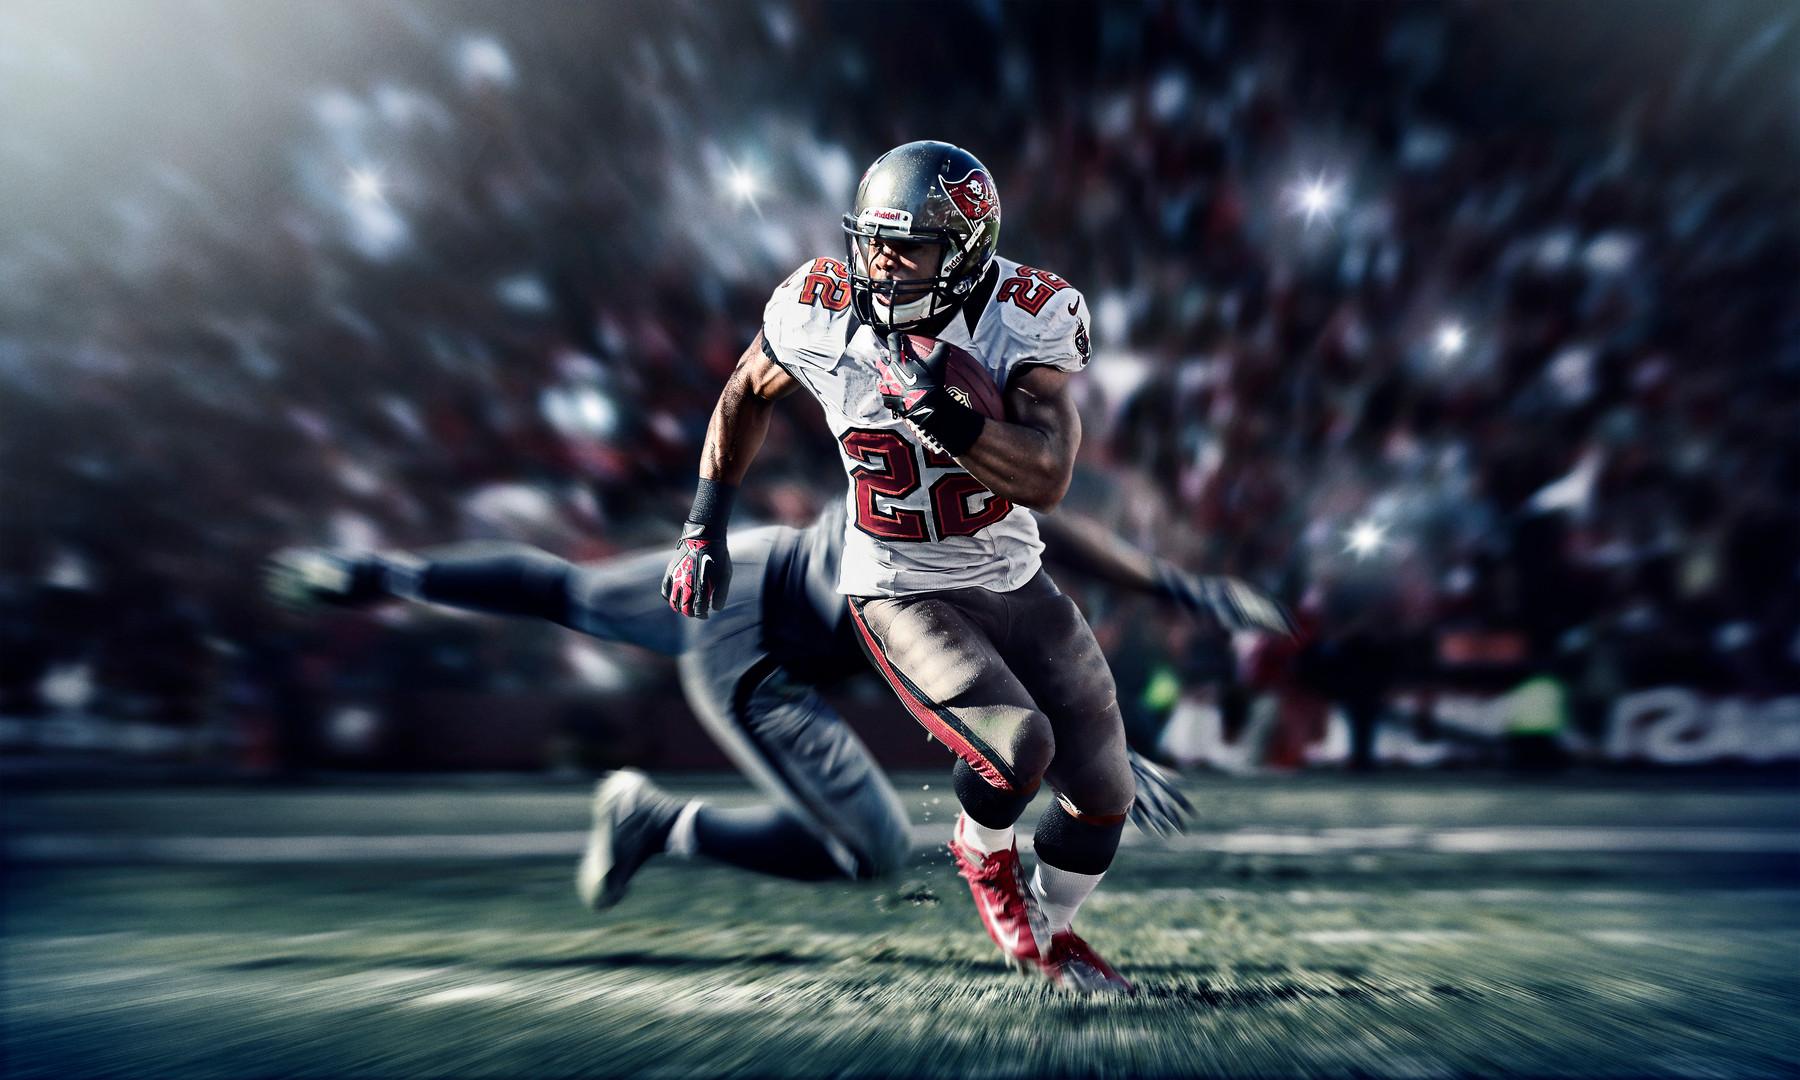 SU13_AT_MARTIN_NFL_BUCANEERS_INGAME_f2_r